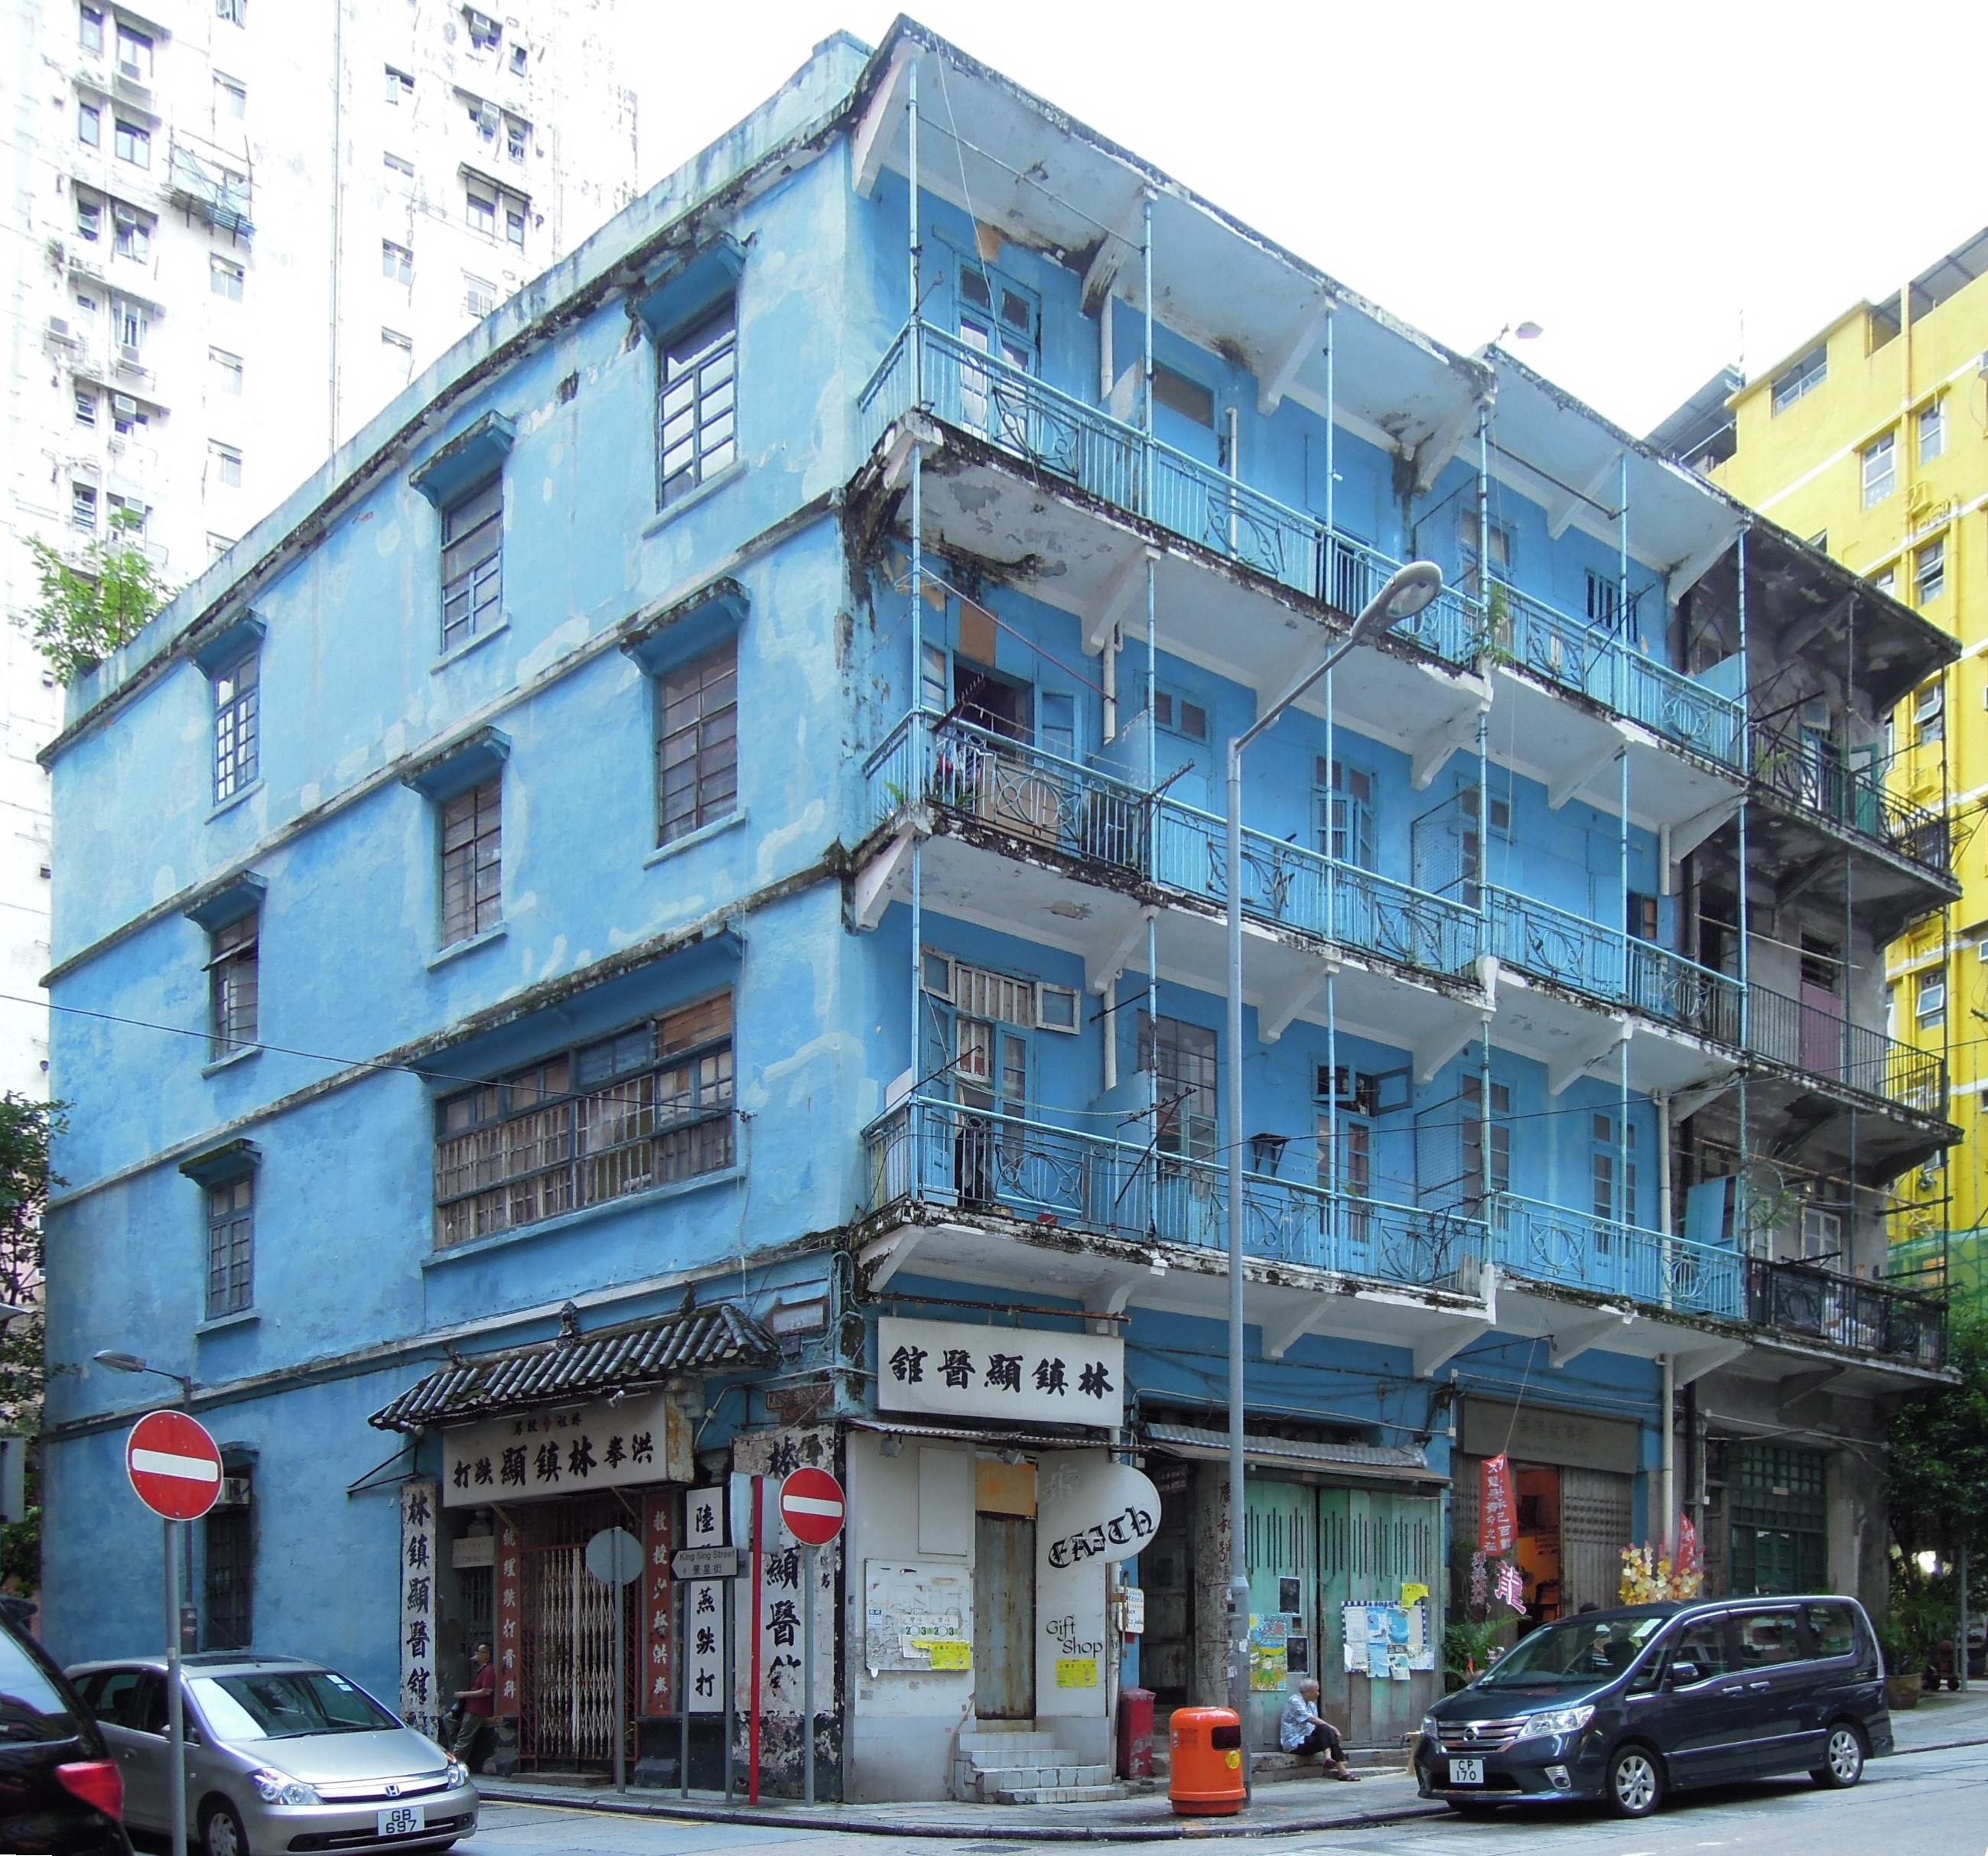 Hong Kong Airport Floor Plan The Best Of Hong Kong Architecture Top 10 Buildings